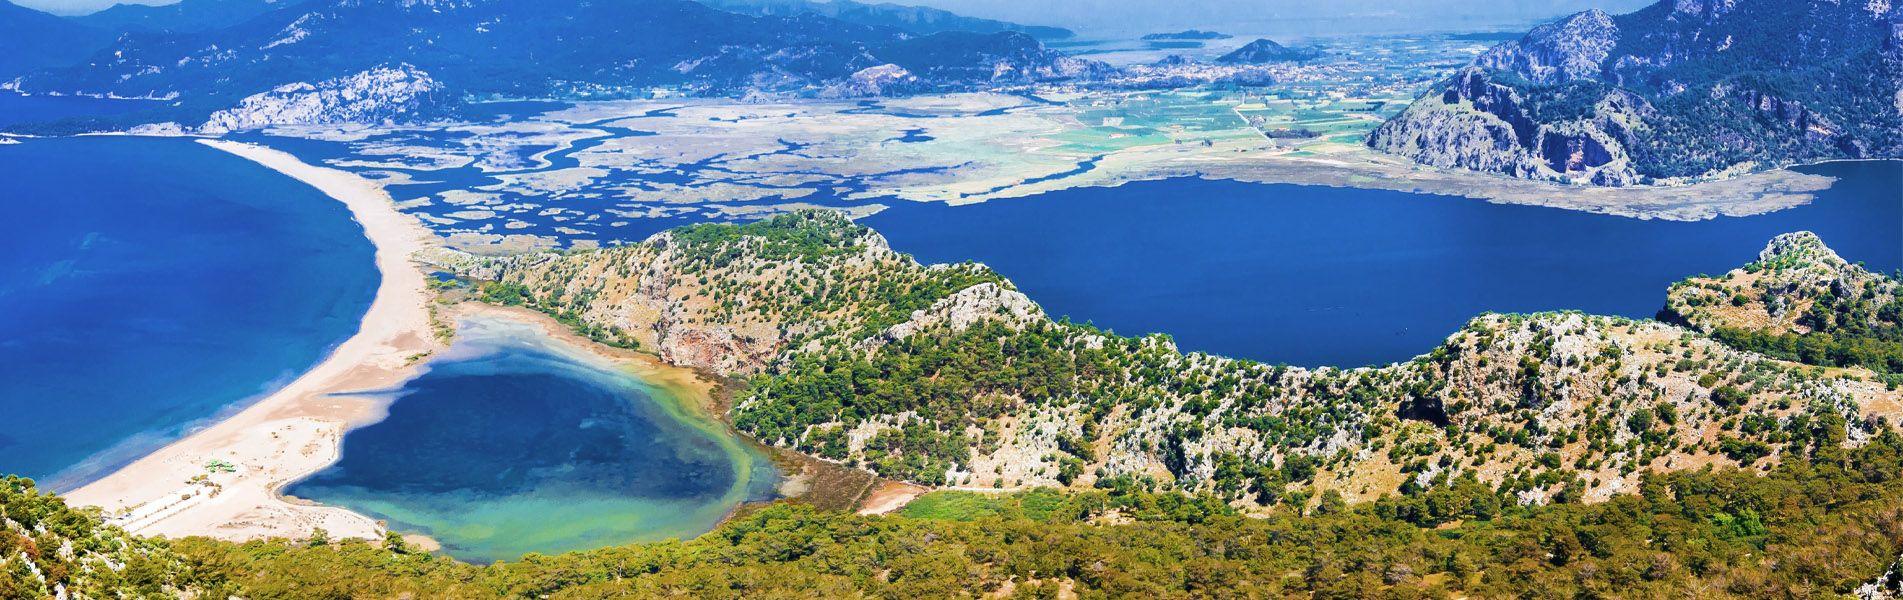 Playa İztuzu, Turquía